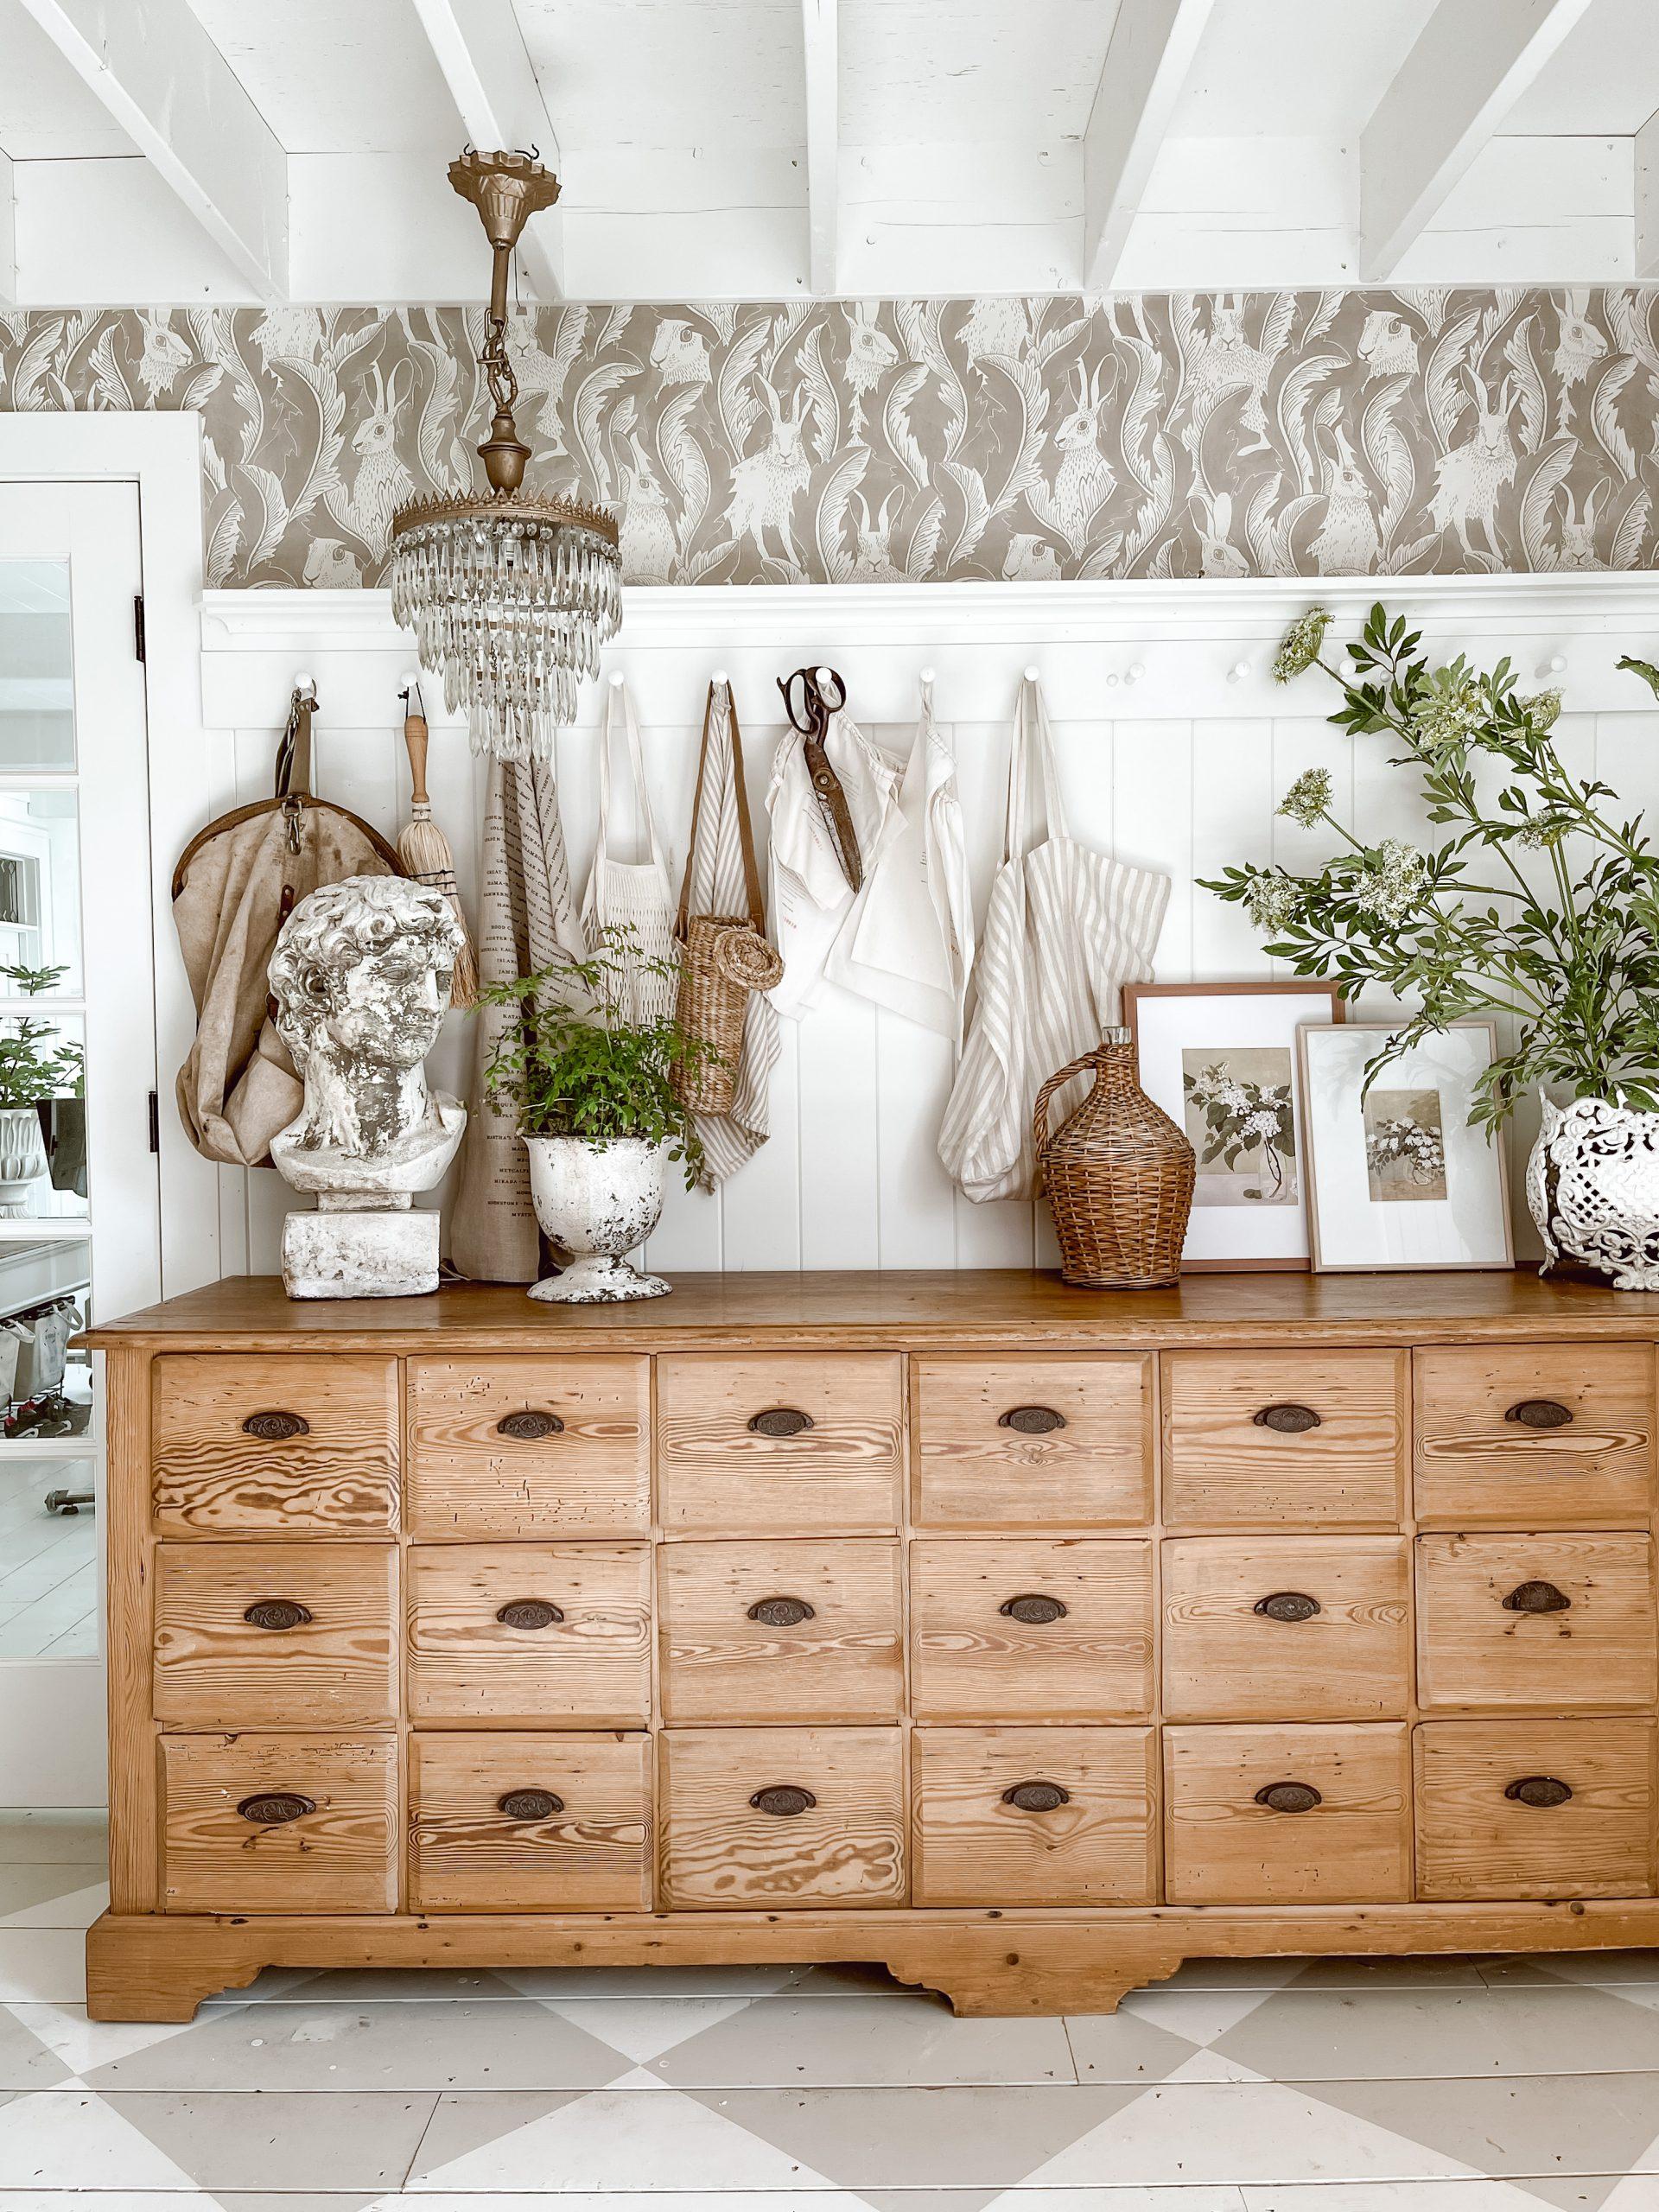 Antique Mudroom Dresser: To sink or not to sink?